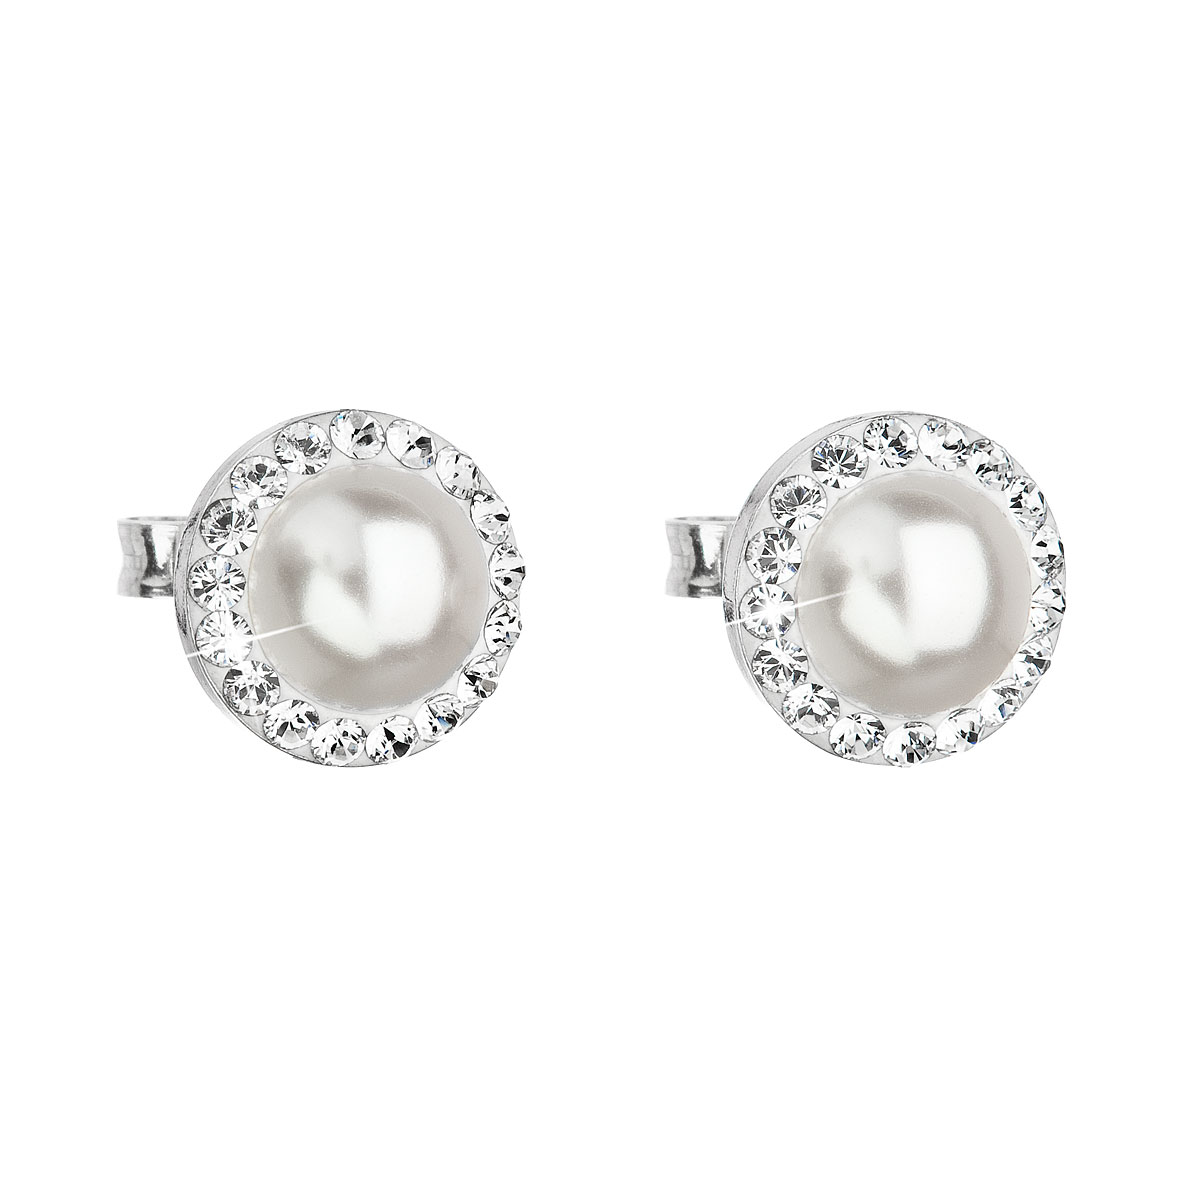 Evolution Group Stříbrné náušnice pecka s krystaly Swarovski a bílou perlou kulaté 31214.1